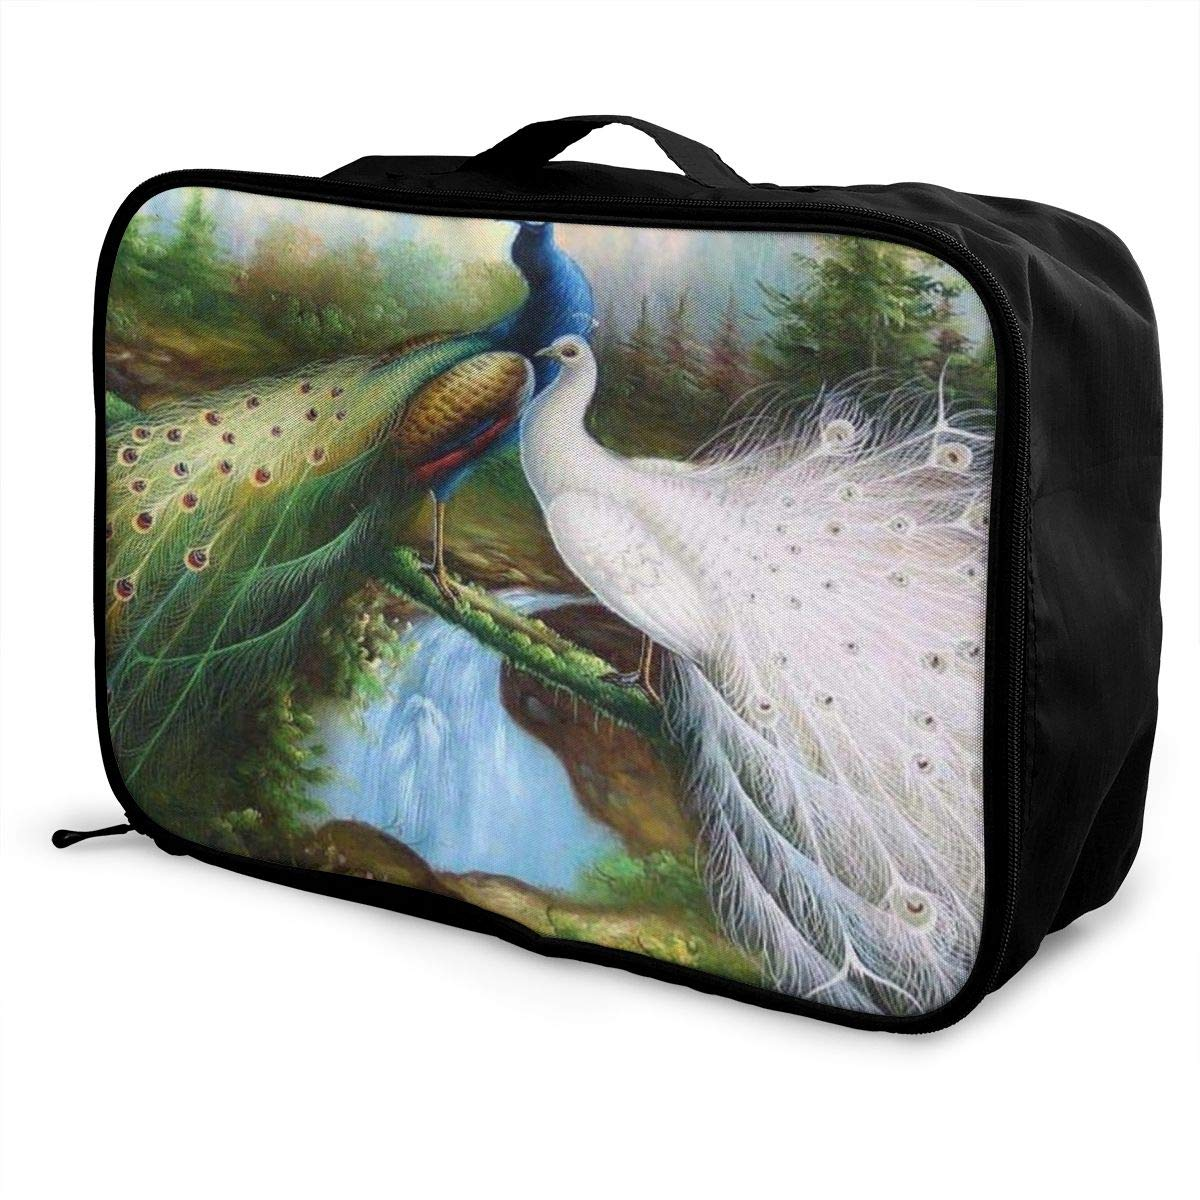 Travel Luggage Duffle Bag Lightweight Portable Handbag Peacock Large Capacity Waterproof Foldable Storage Tote